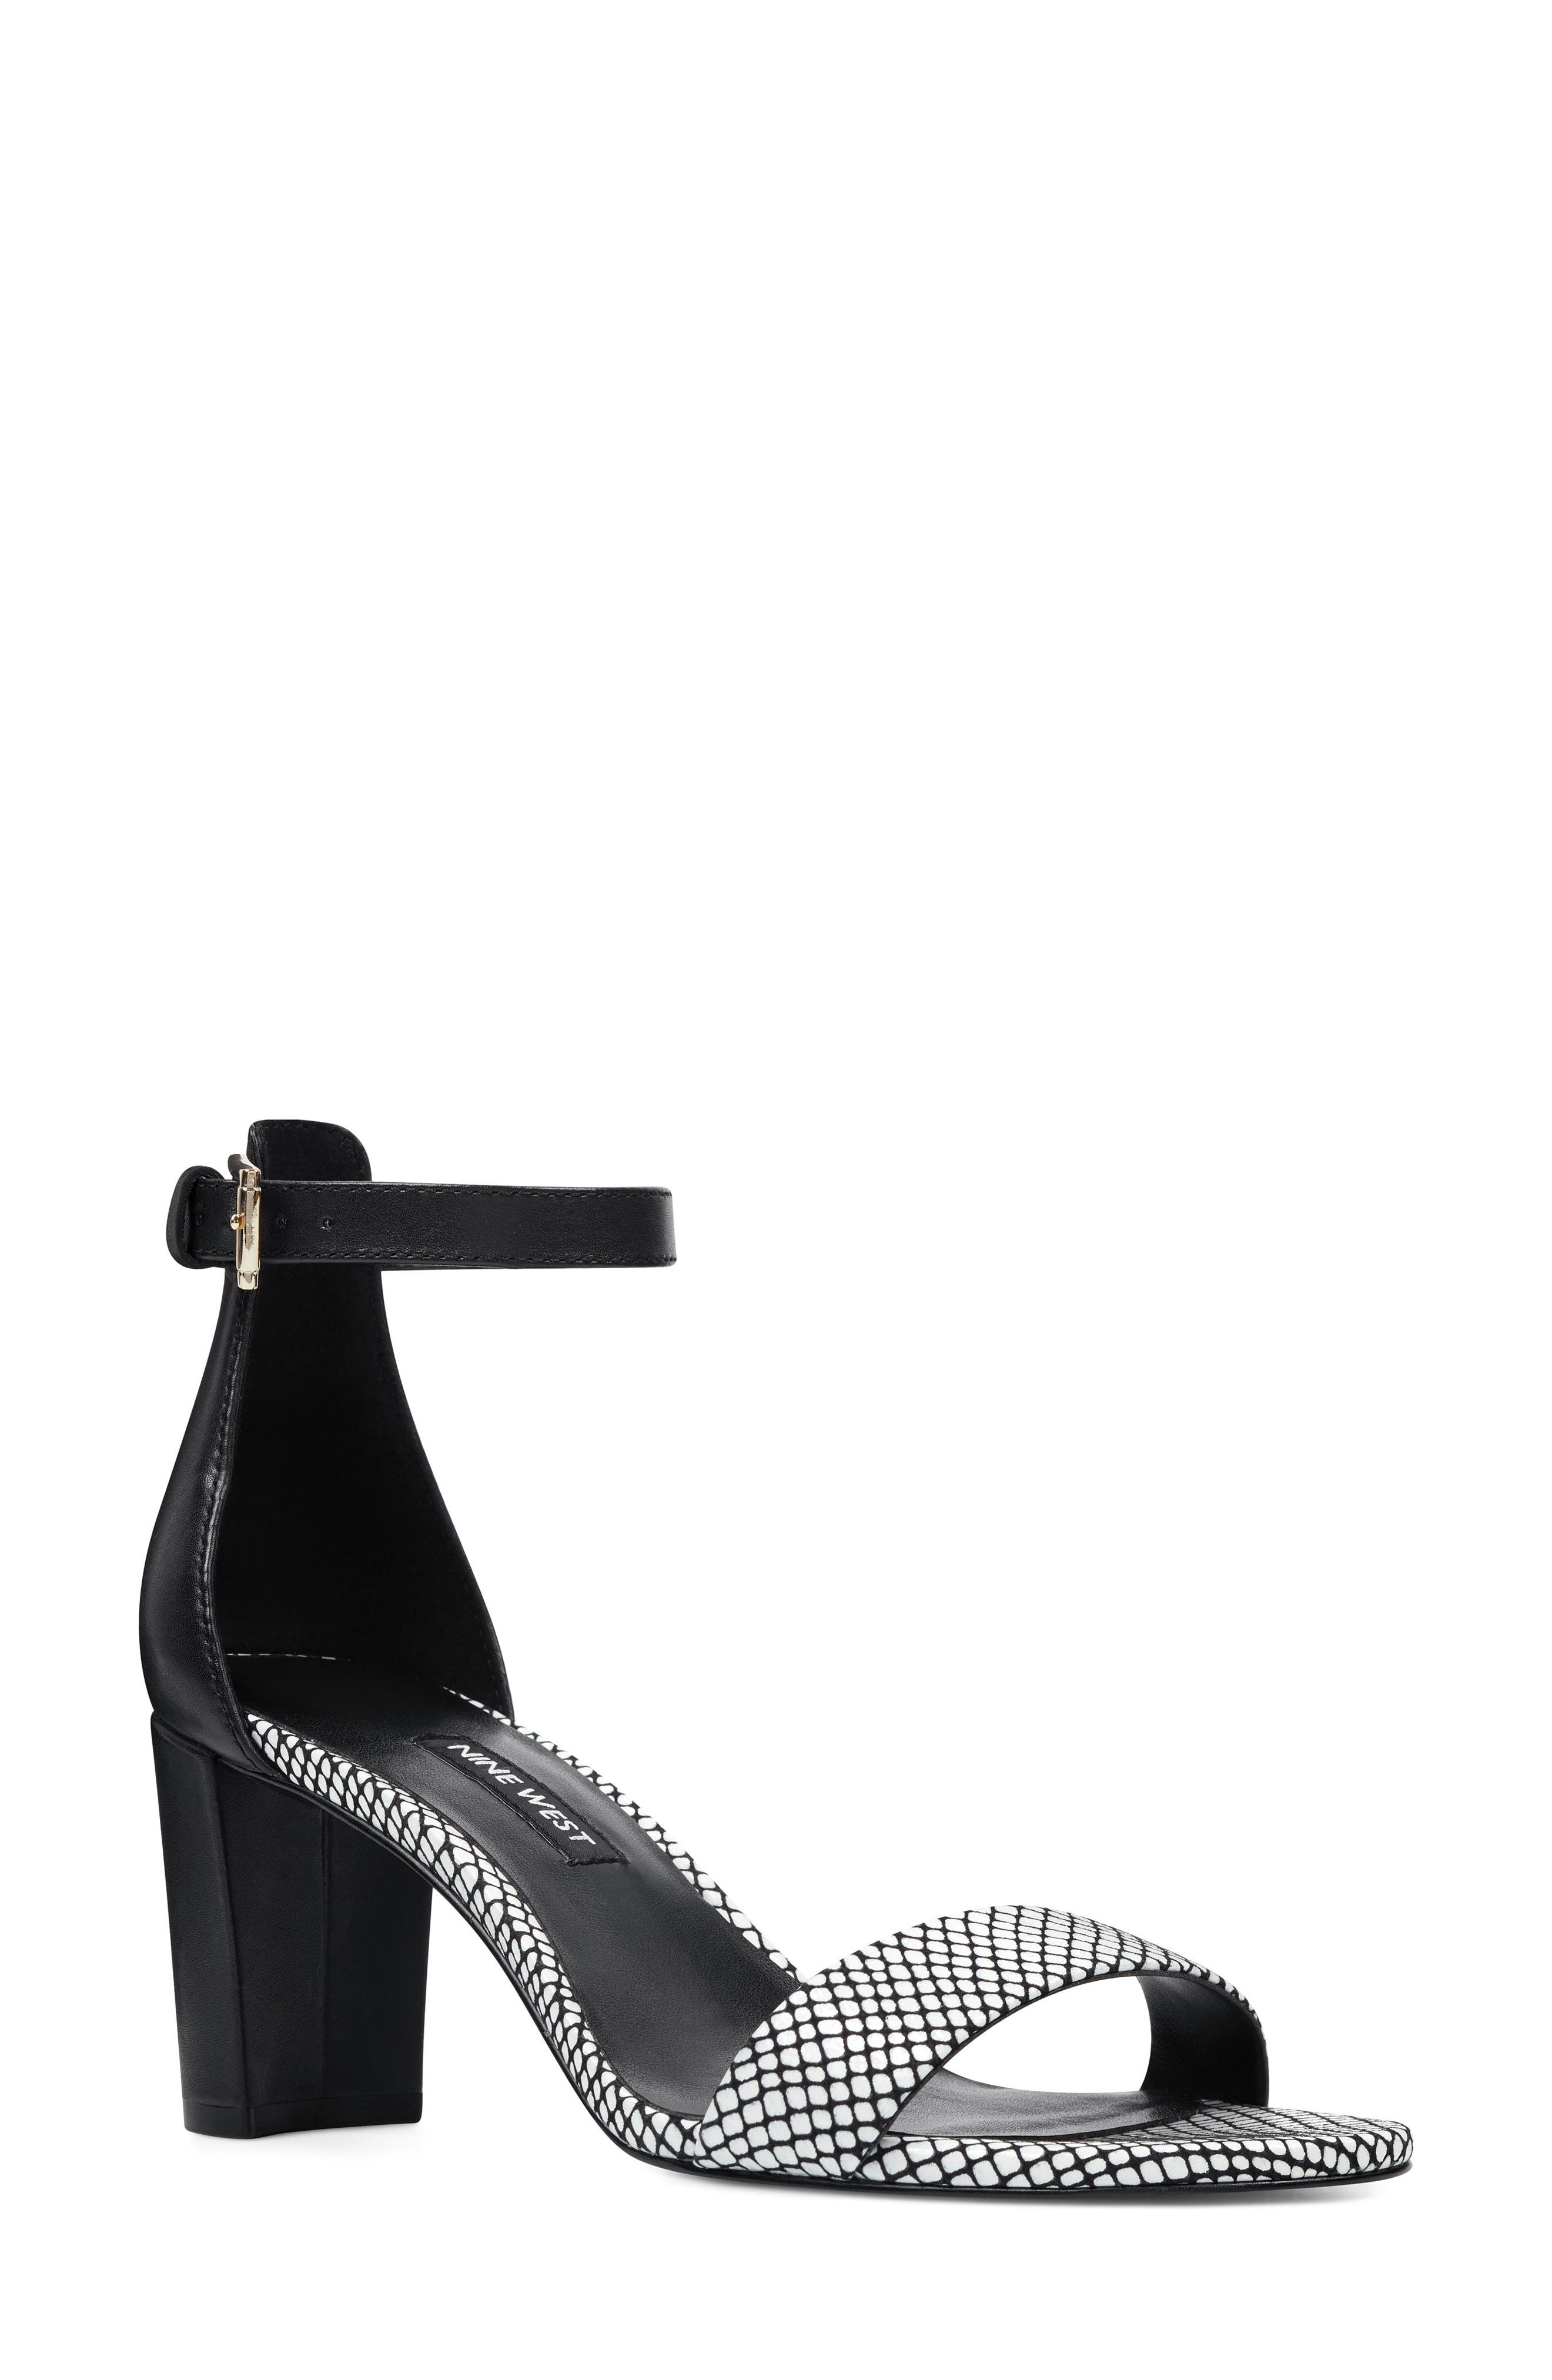 Pruce Ankle Strap Sandal, Main, color, BLACK/ WHITE LEATHER